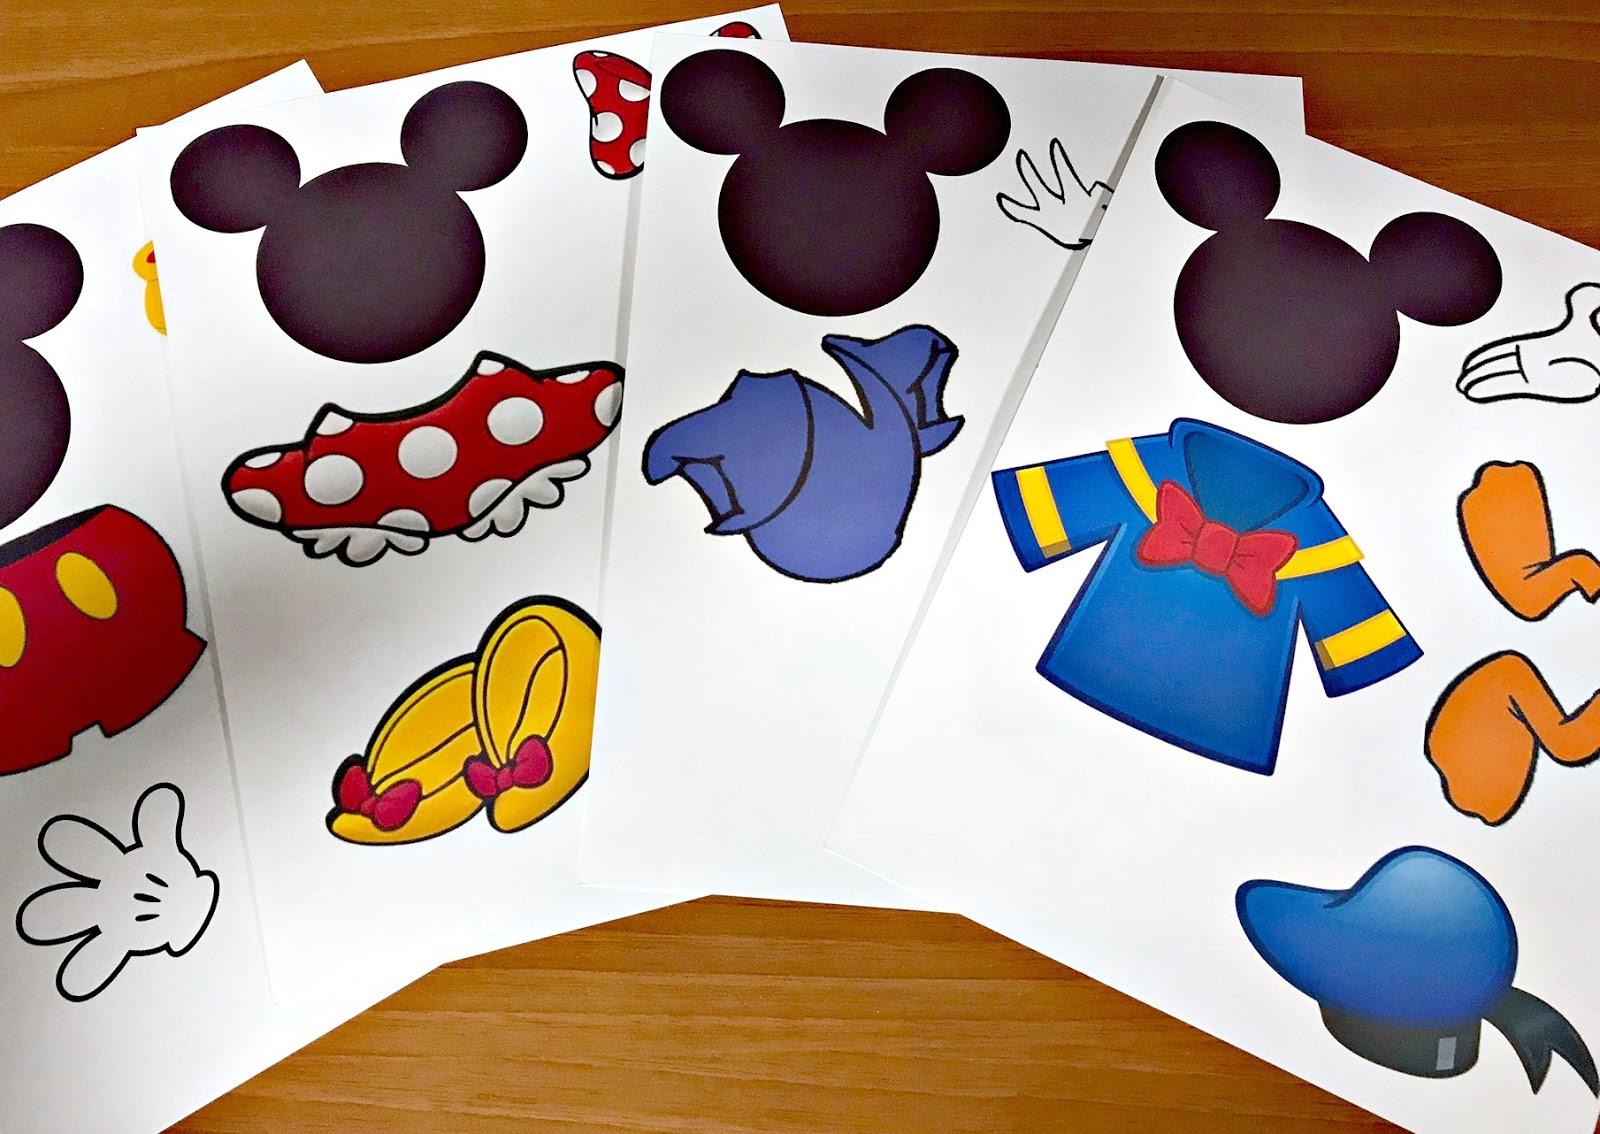 photo regarding Disney Cruise Door Decorations Printable named Do it yourself Disney Cruise Doorway Magnets Printable - We Bought The Funk